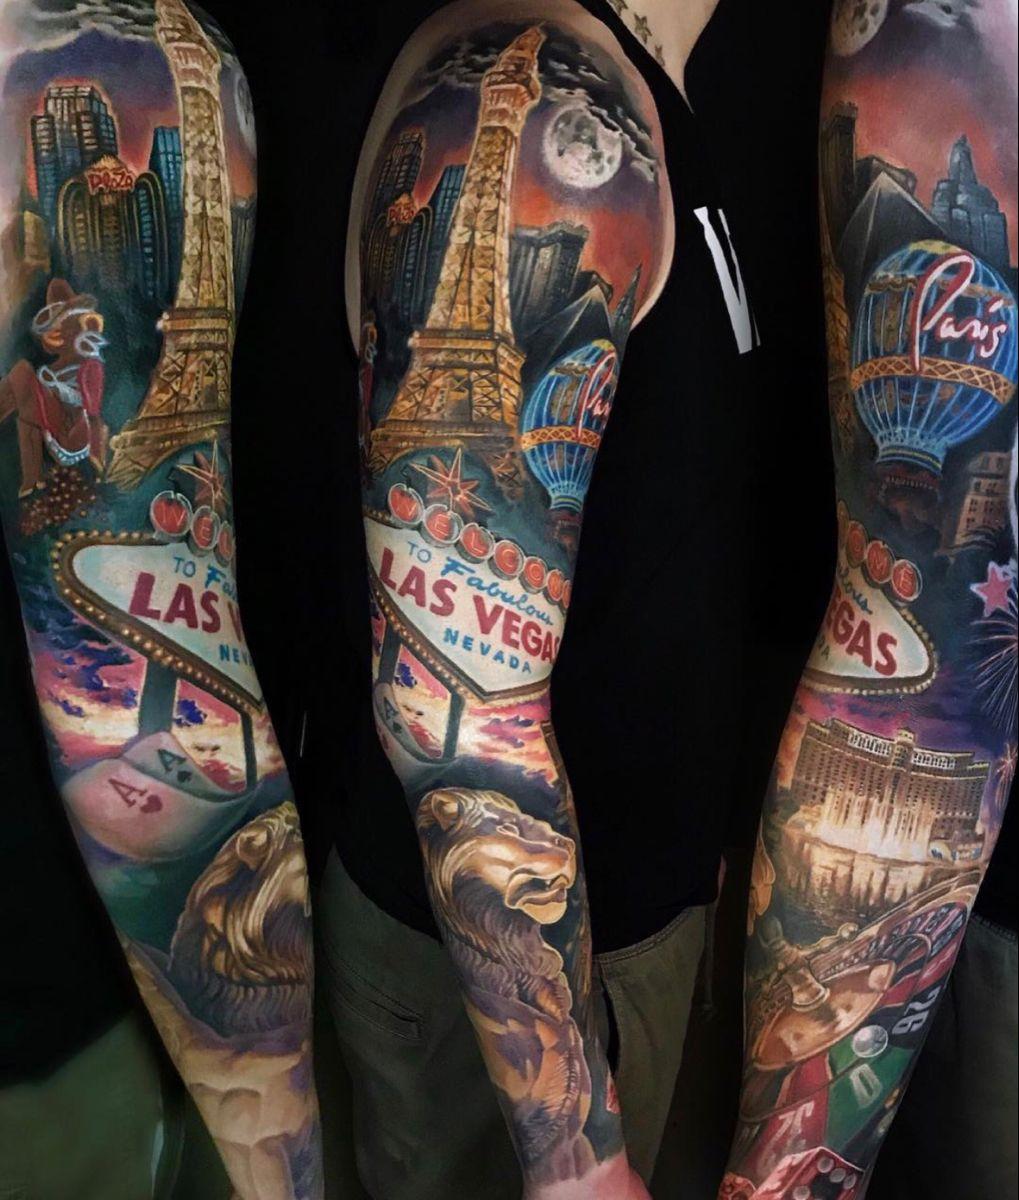 #lasvegastattoo #lasvegasphotography #tattooideas #tattooart #tattoodesign #lasvegastrip #londontattoo #tattooart #colortattoo #realistictattoo #colorrealism #londontattoostudio #lasvegas